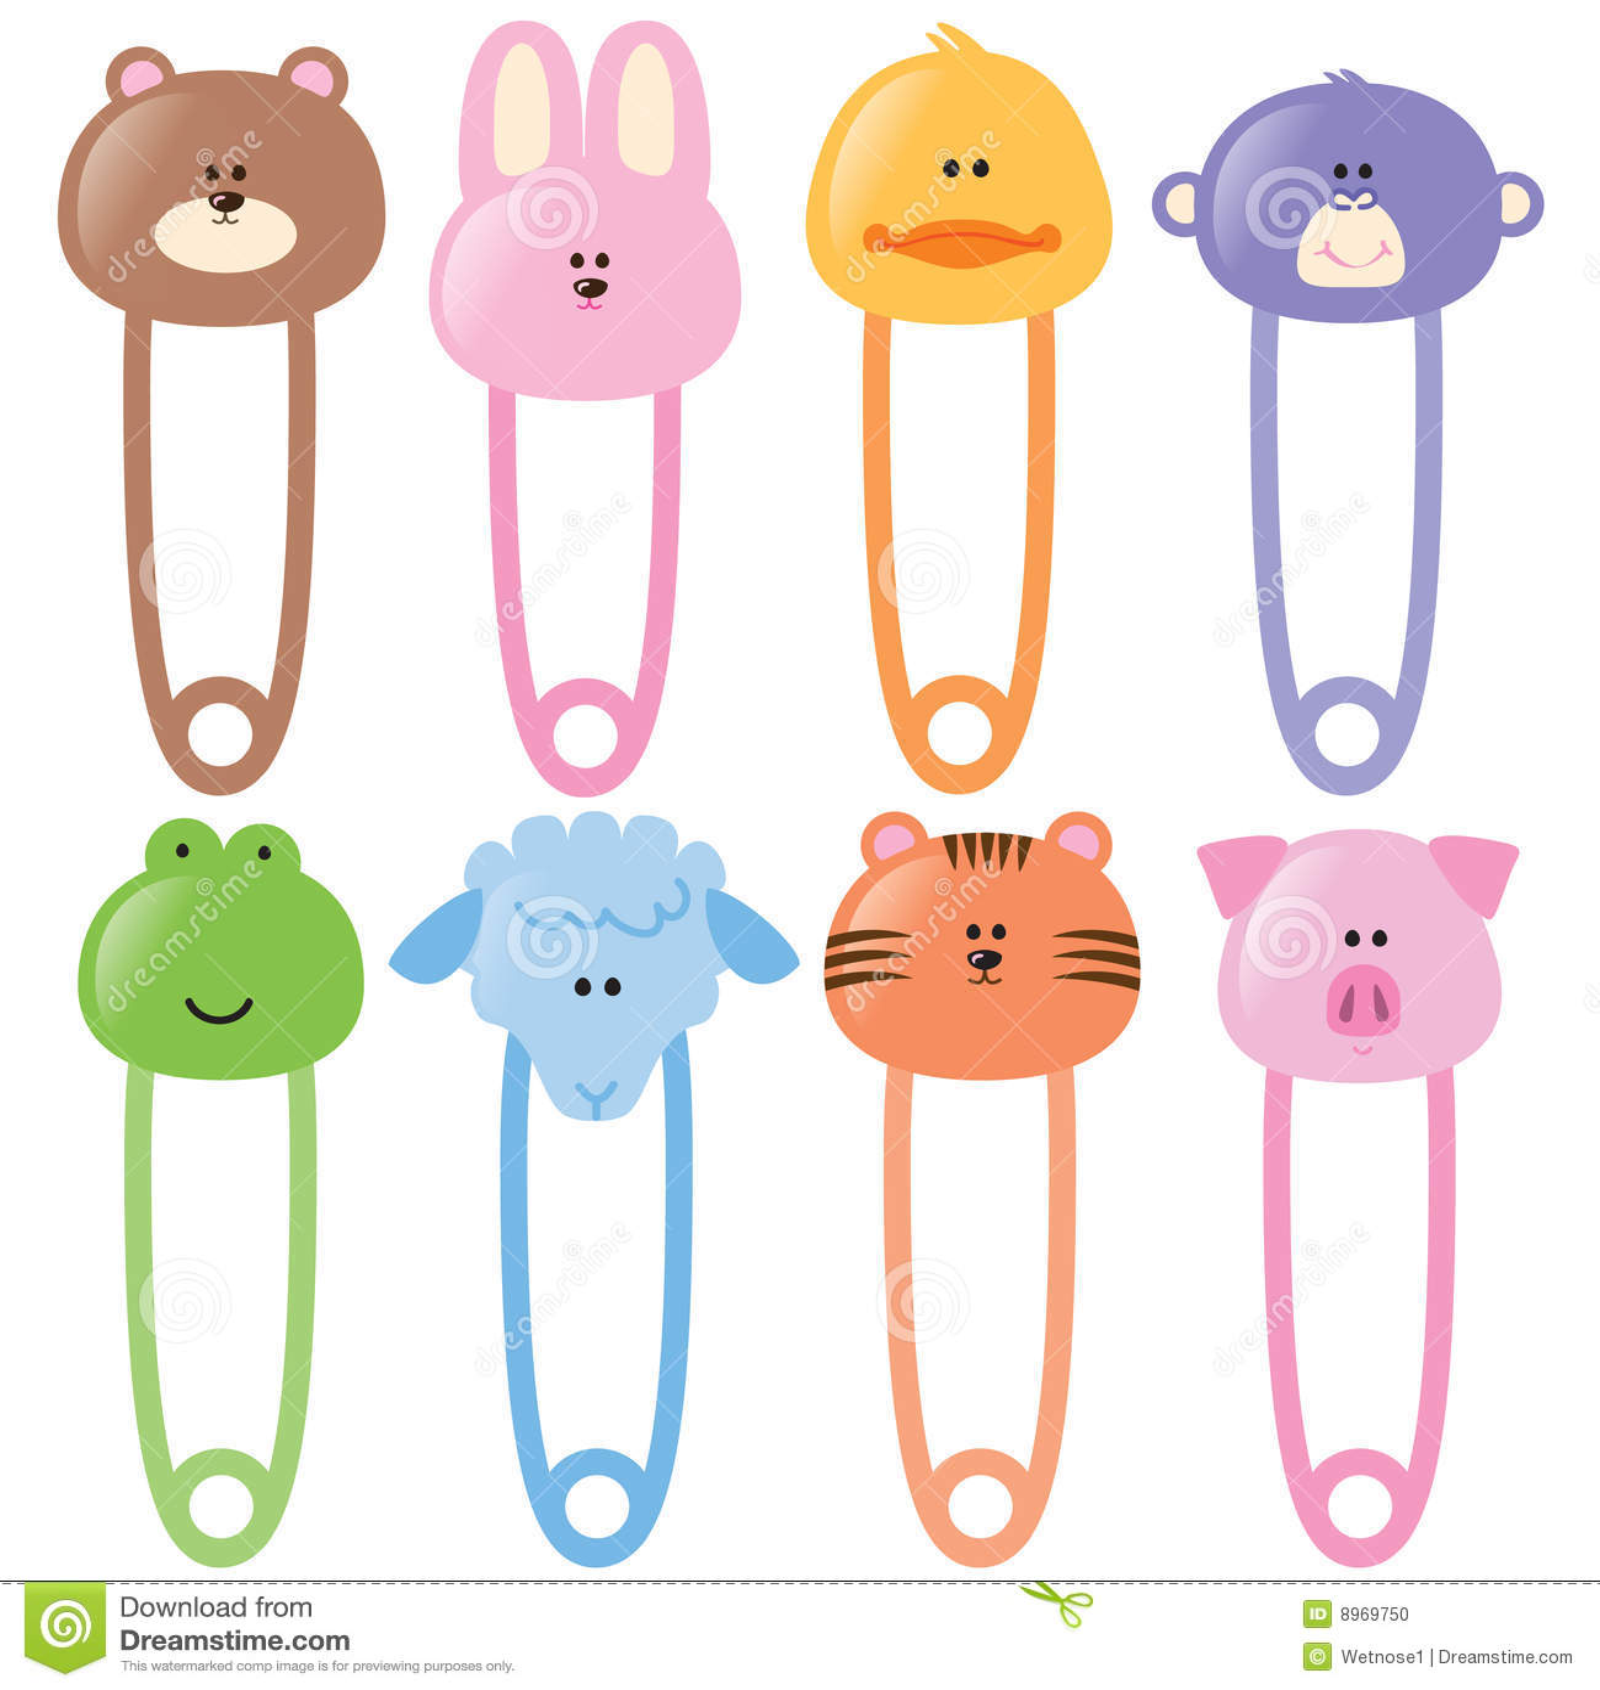 Baby Animamls Safety Pins Set 1 Illustration 8969750 Megapixl